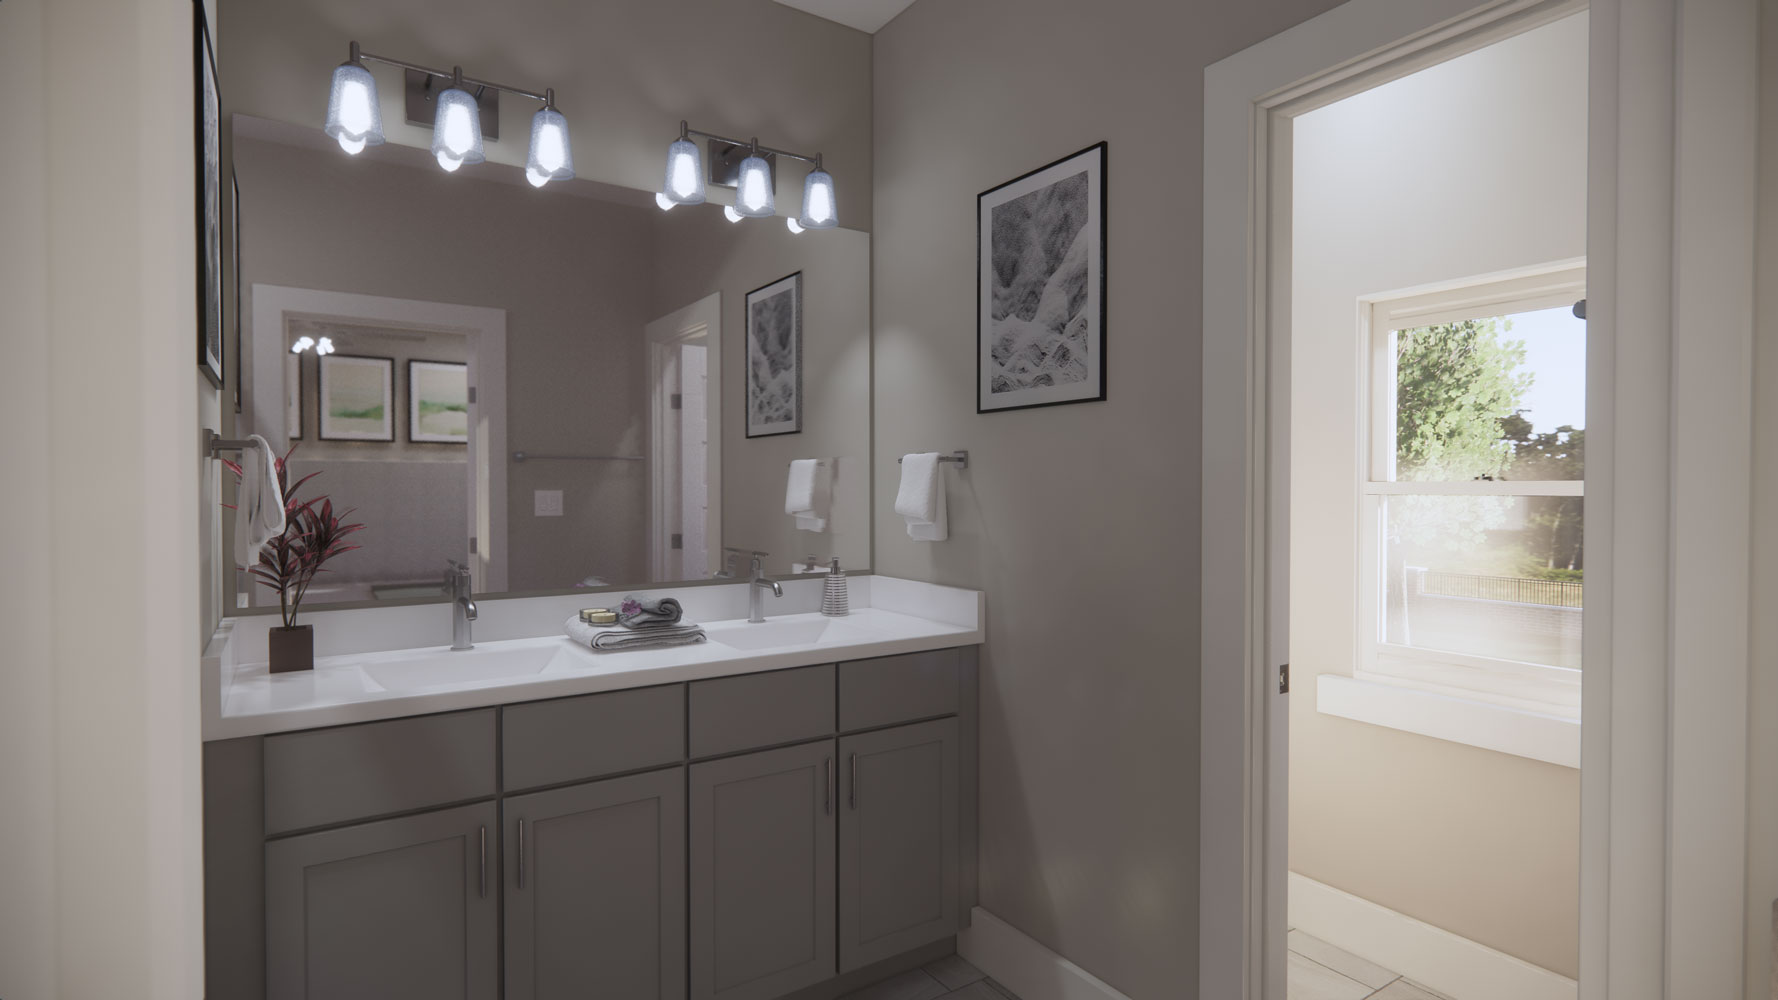 Ample Bathroom Lighting at Echelon at Reverchon Bluffs in Dallas, Texas